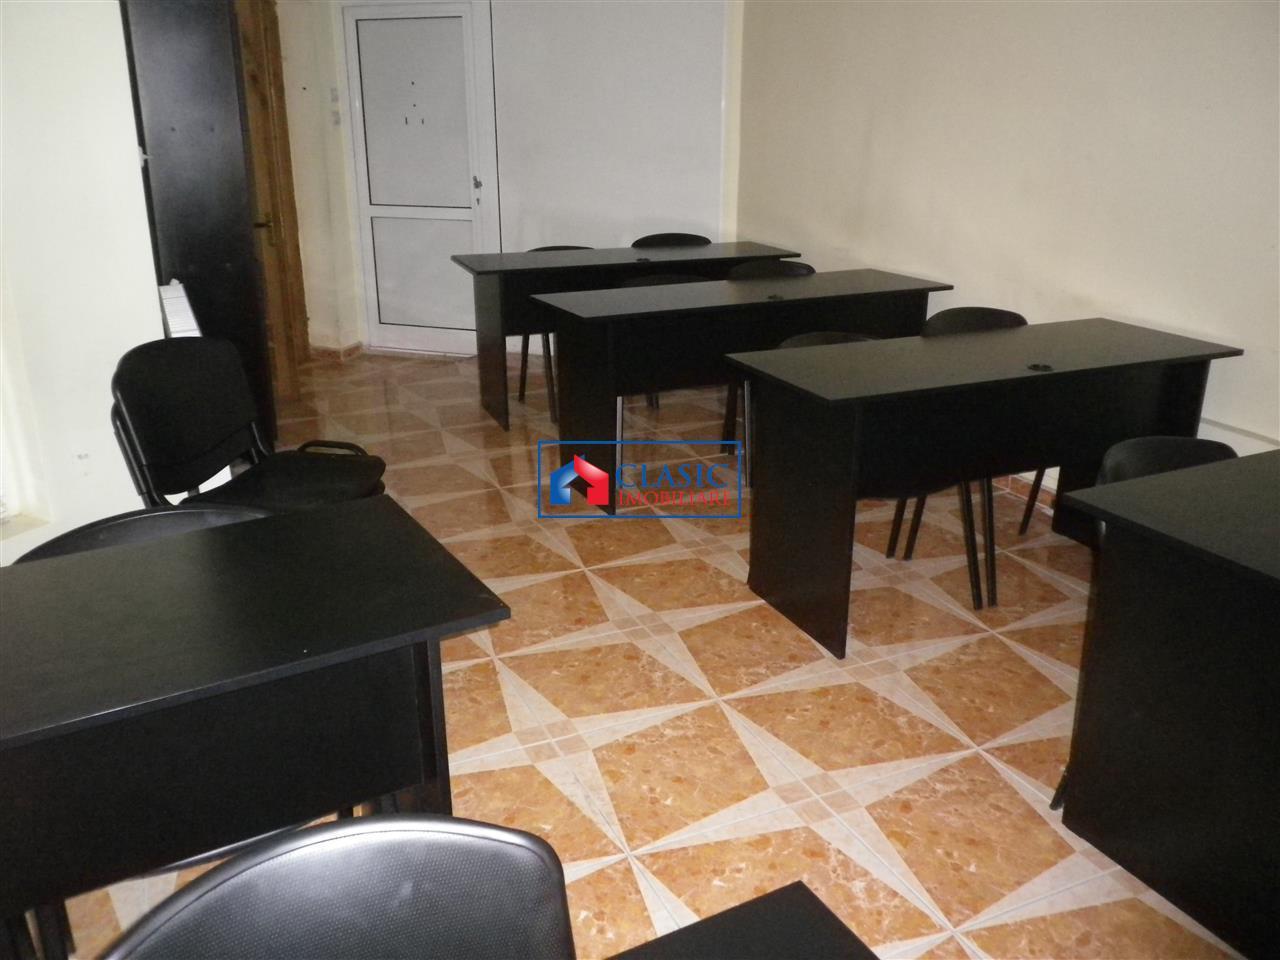 Inchiriere spatii de birouri in casa zona Gruia, Cluj-Napoca